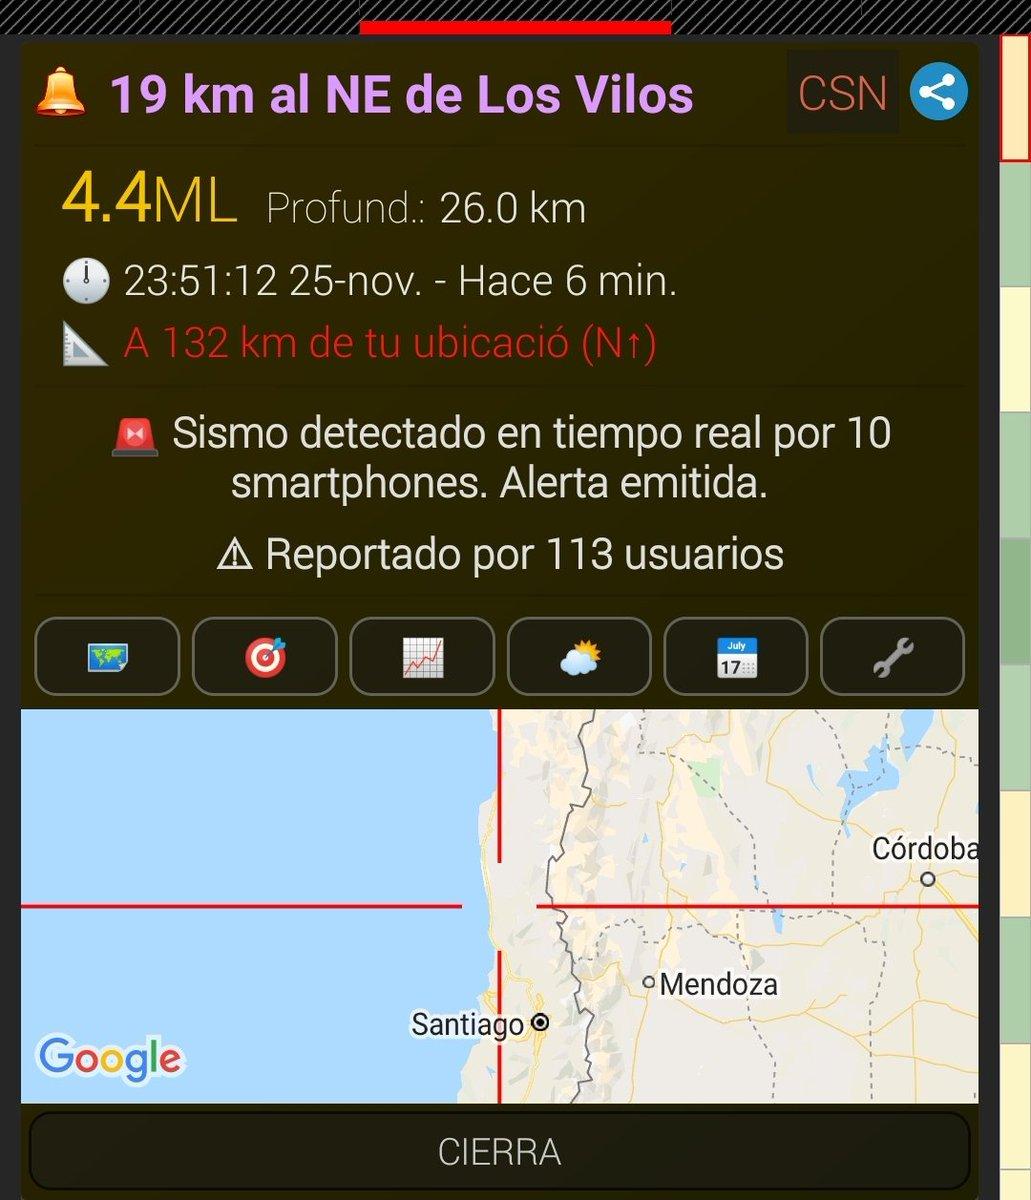 Sismo 4.4 Los Vilos https://t.co/NRHFjePM6I